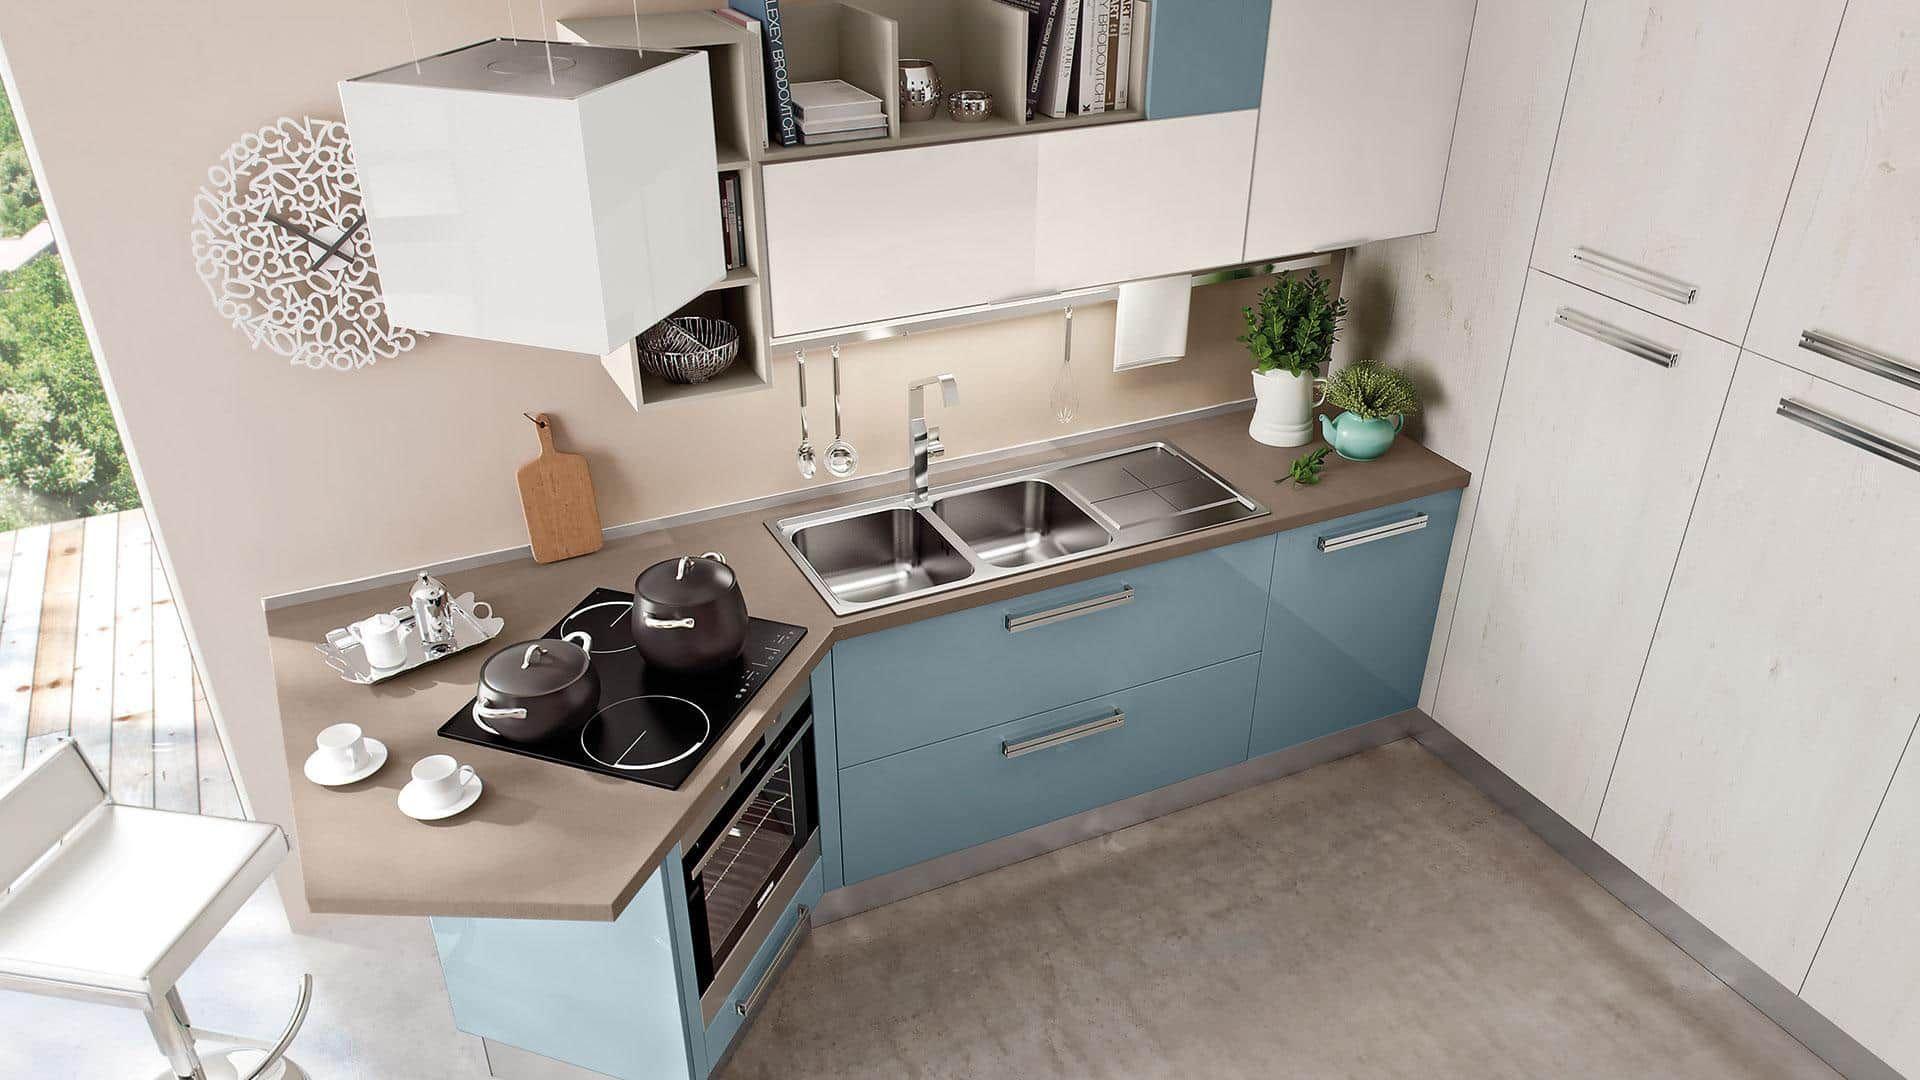 Mobili Per Cucina Piccola cucine a gas arredamento